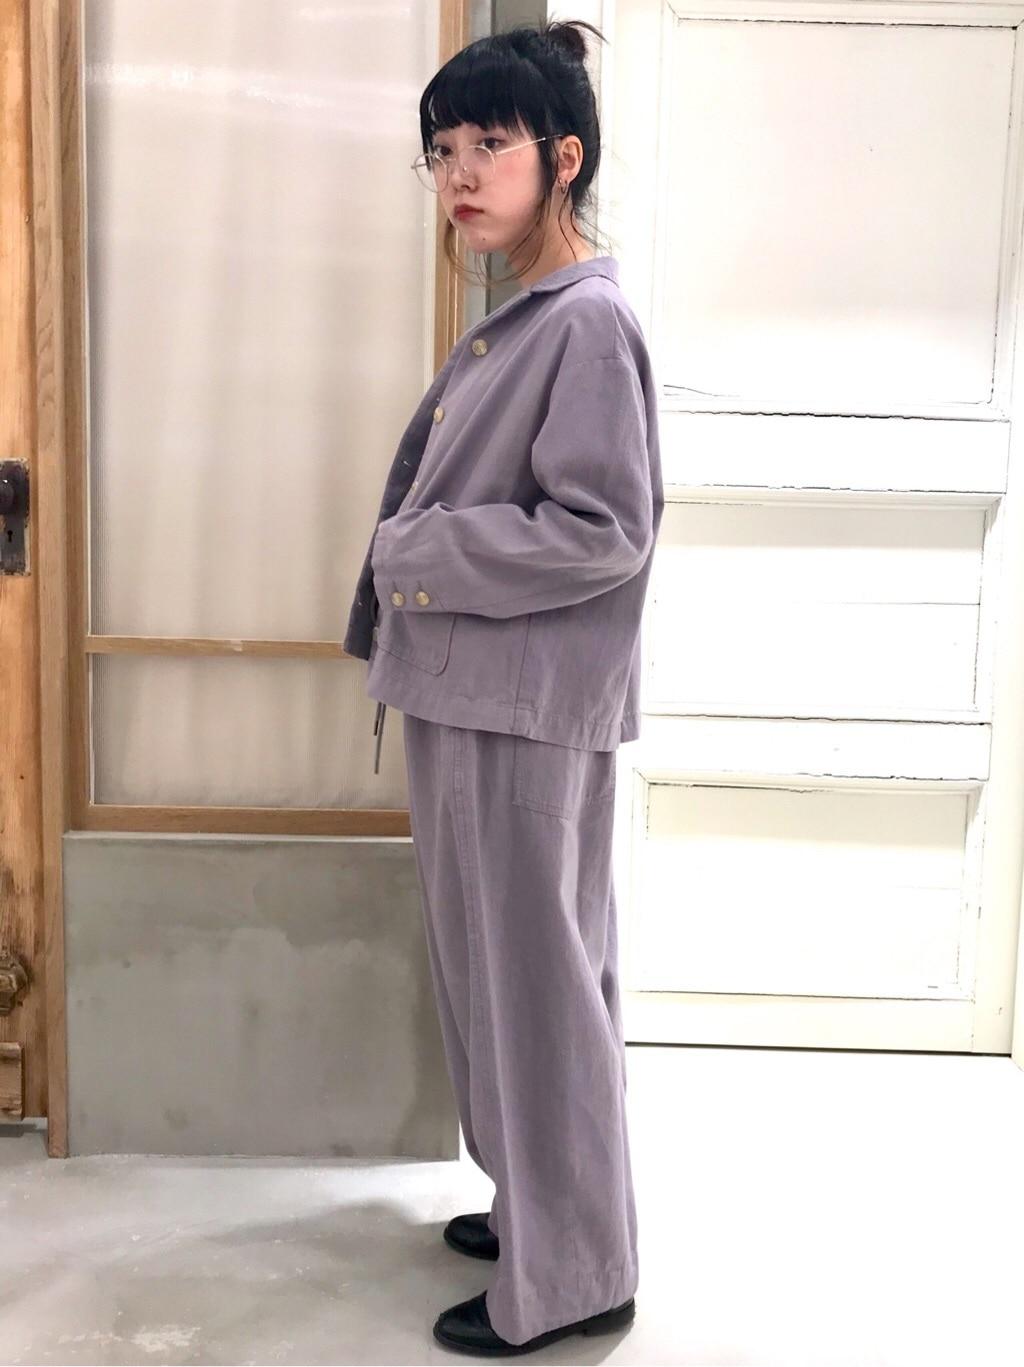 bulle de savon 渋谷スクランブルスクエア 身長:153cm 2020.03.23